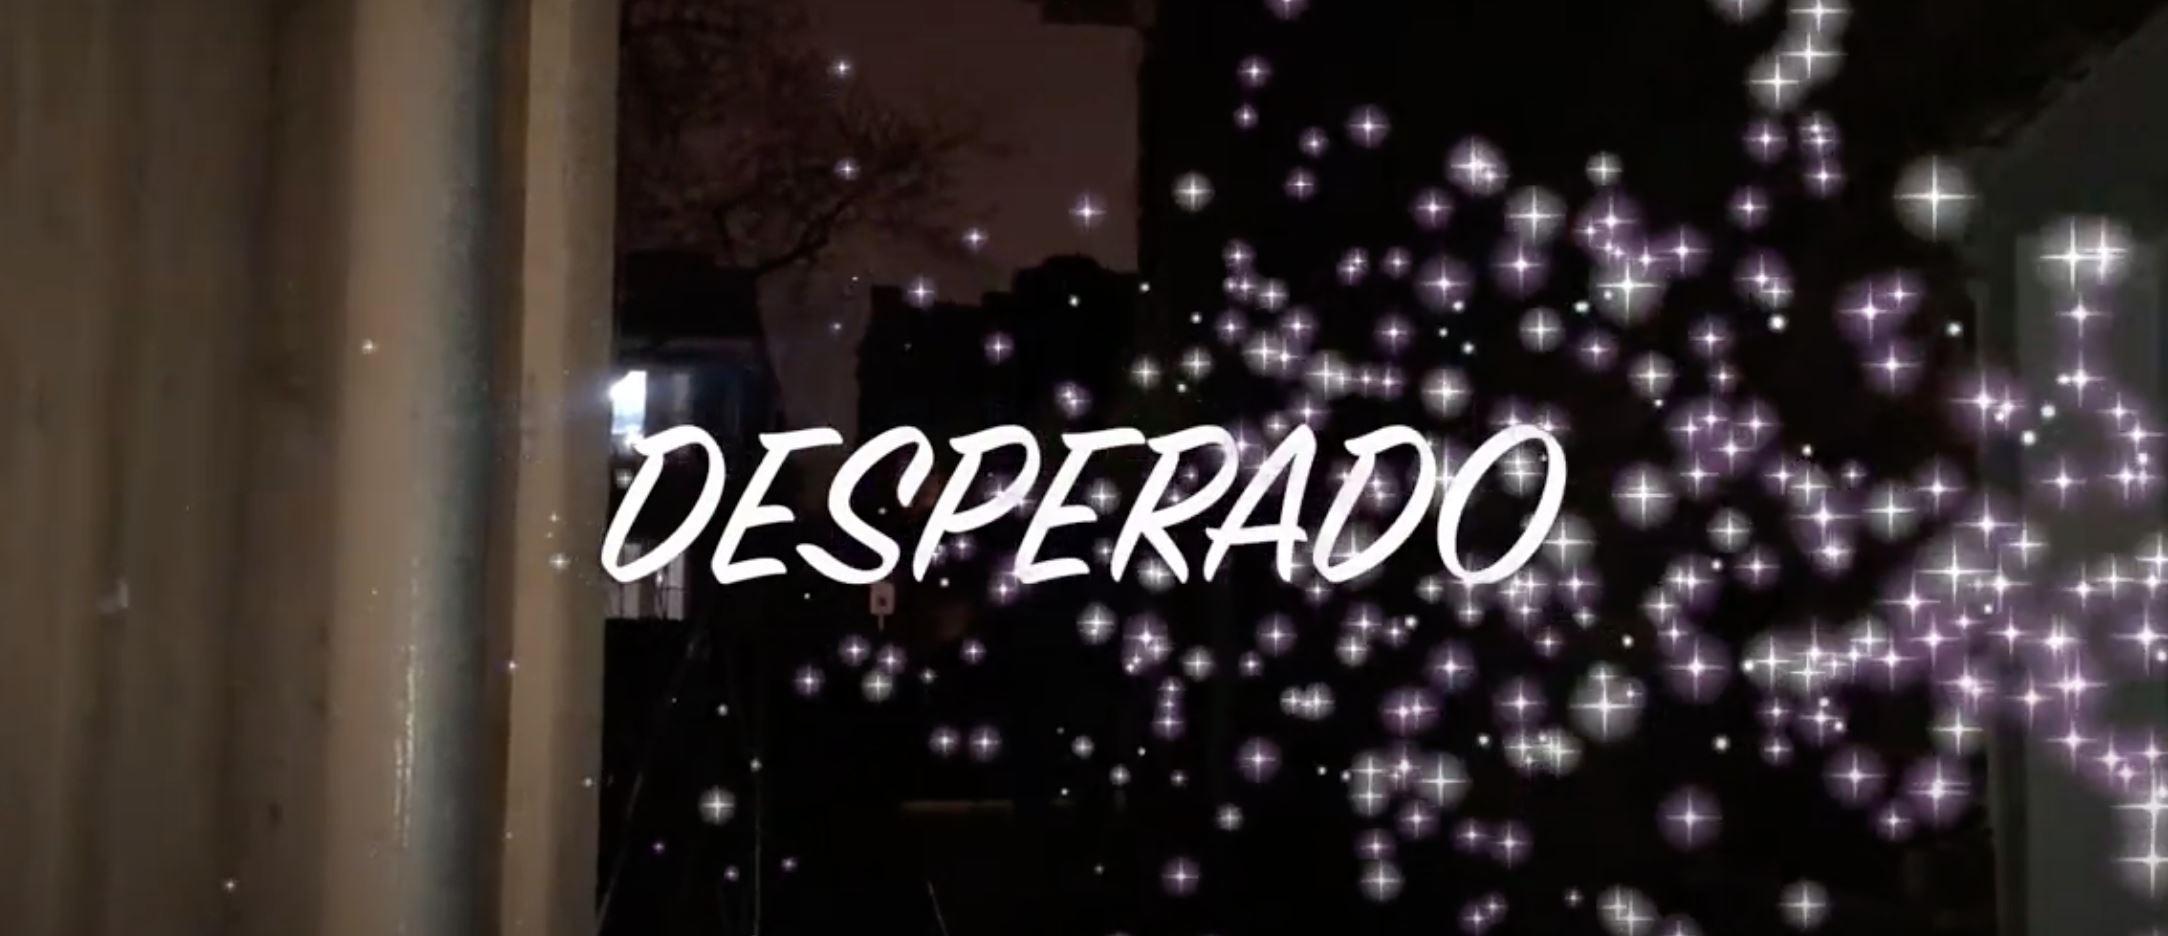 """Desperado Music Video"" by Jakiria Williams"